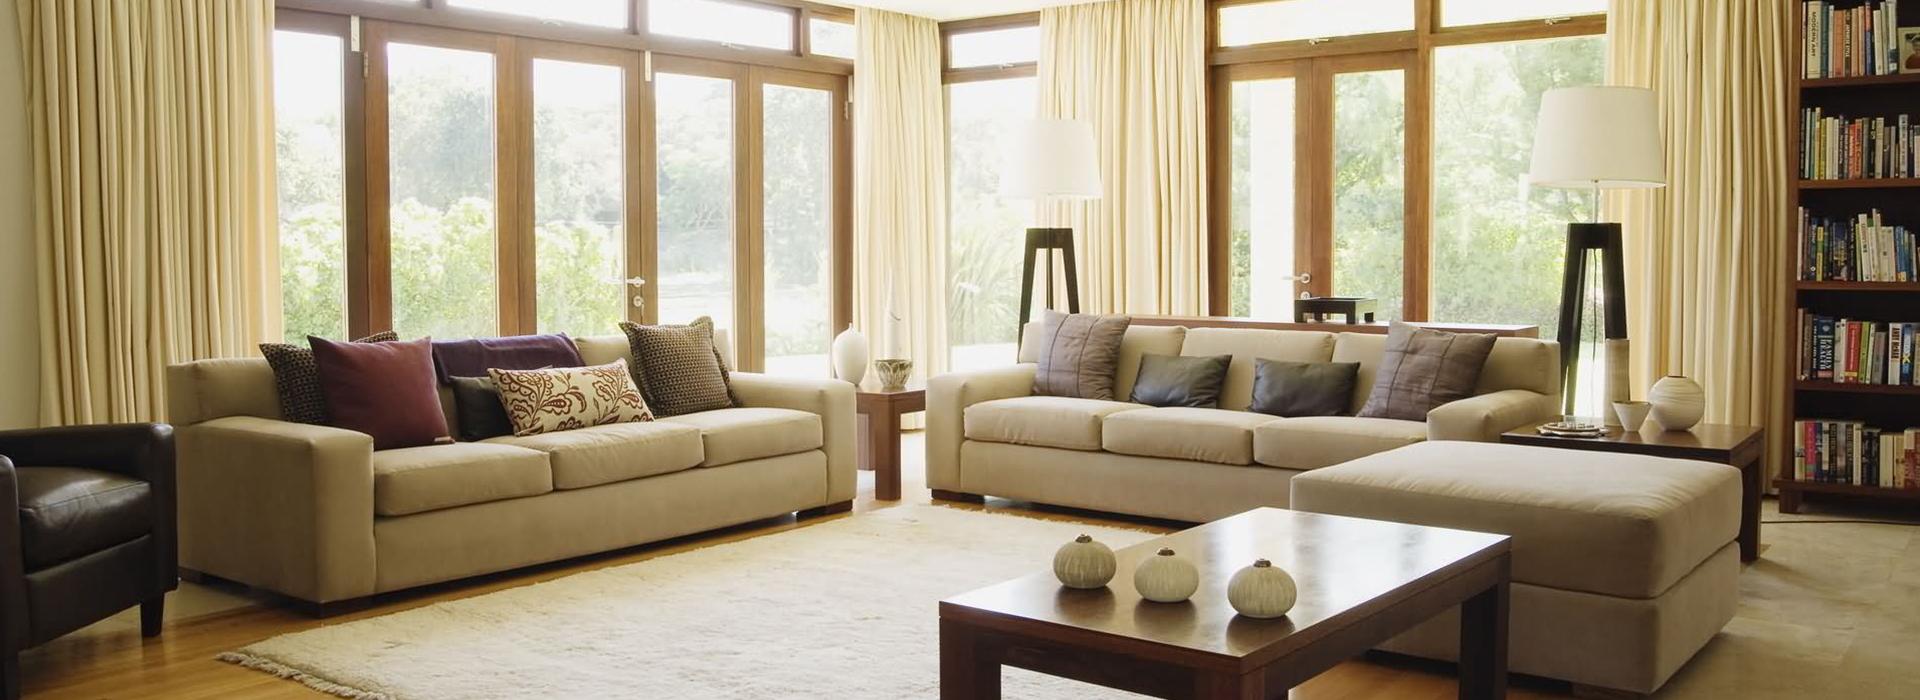 <small>250 квадратных метров роскоши, четырехкомнатные</small>Апартаменты «Пентхаус»